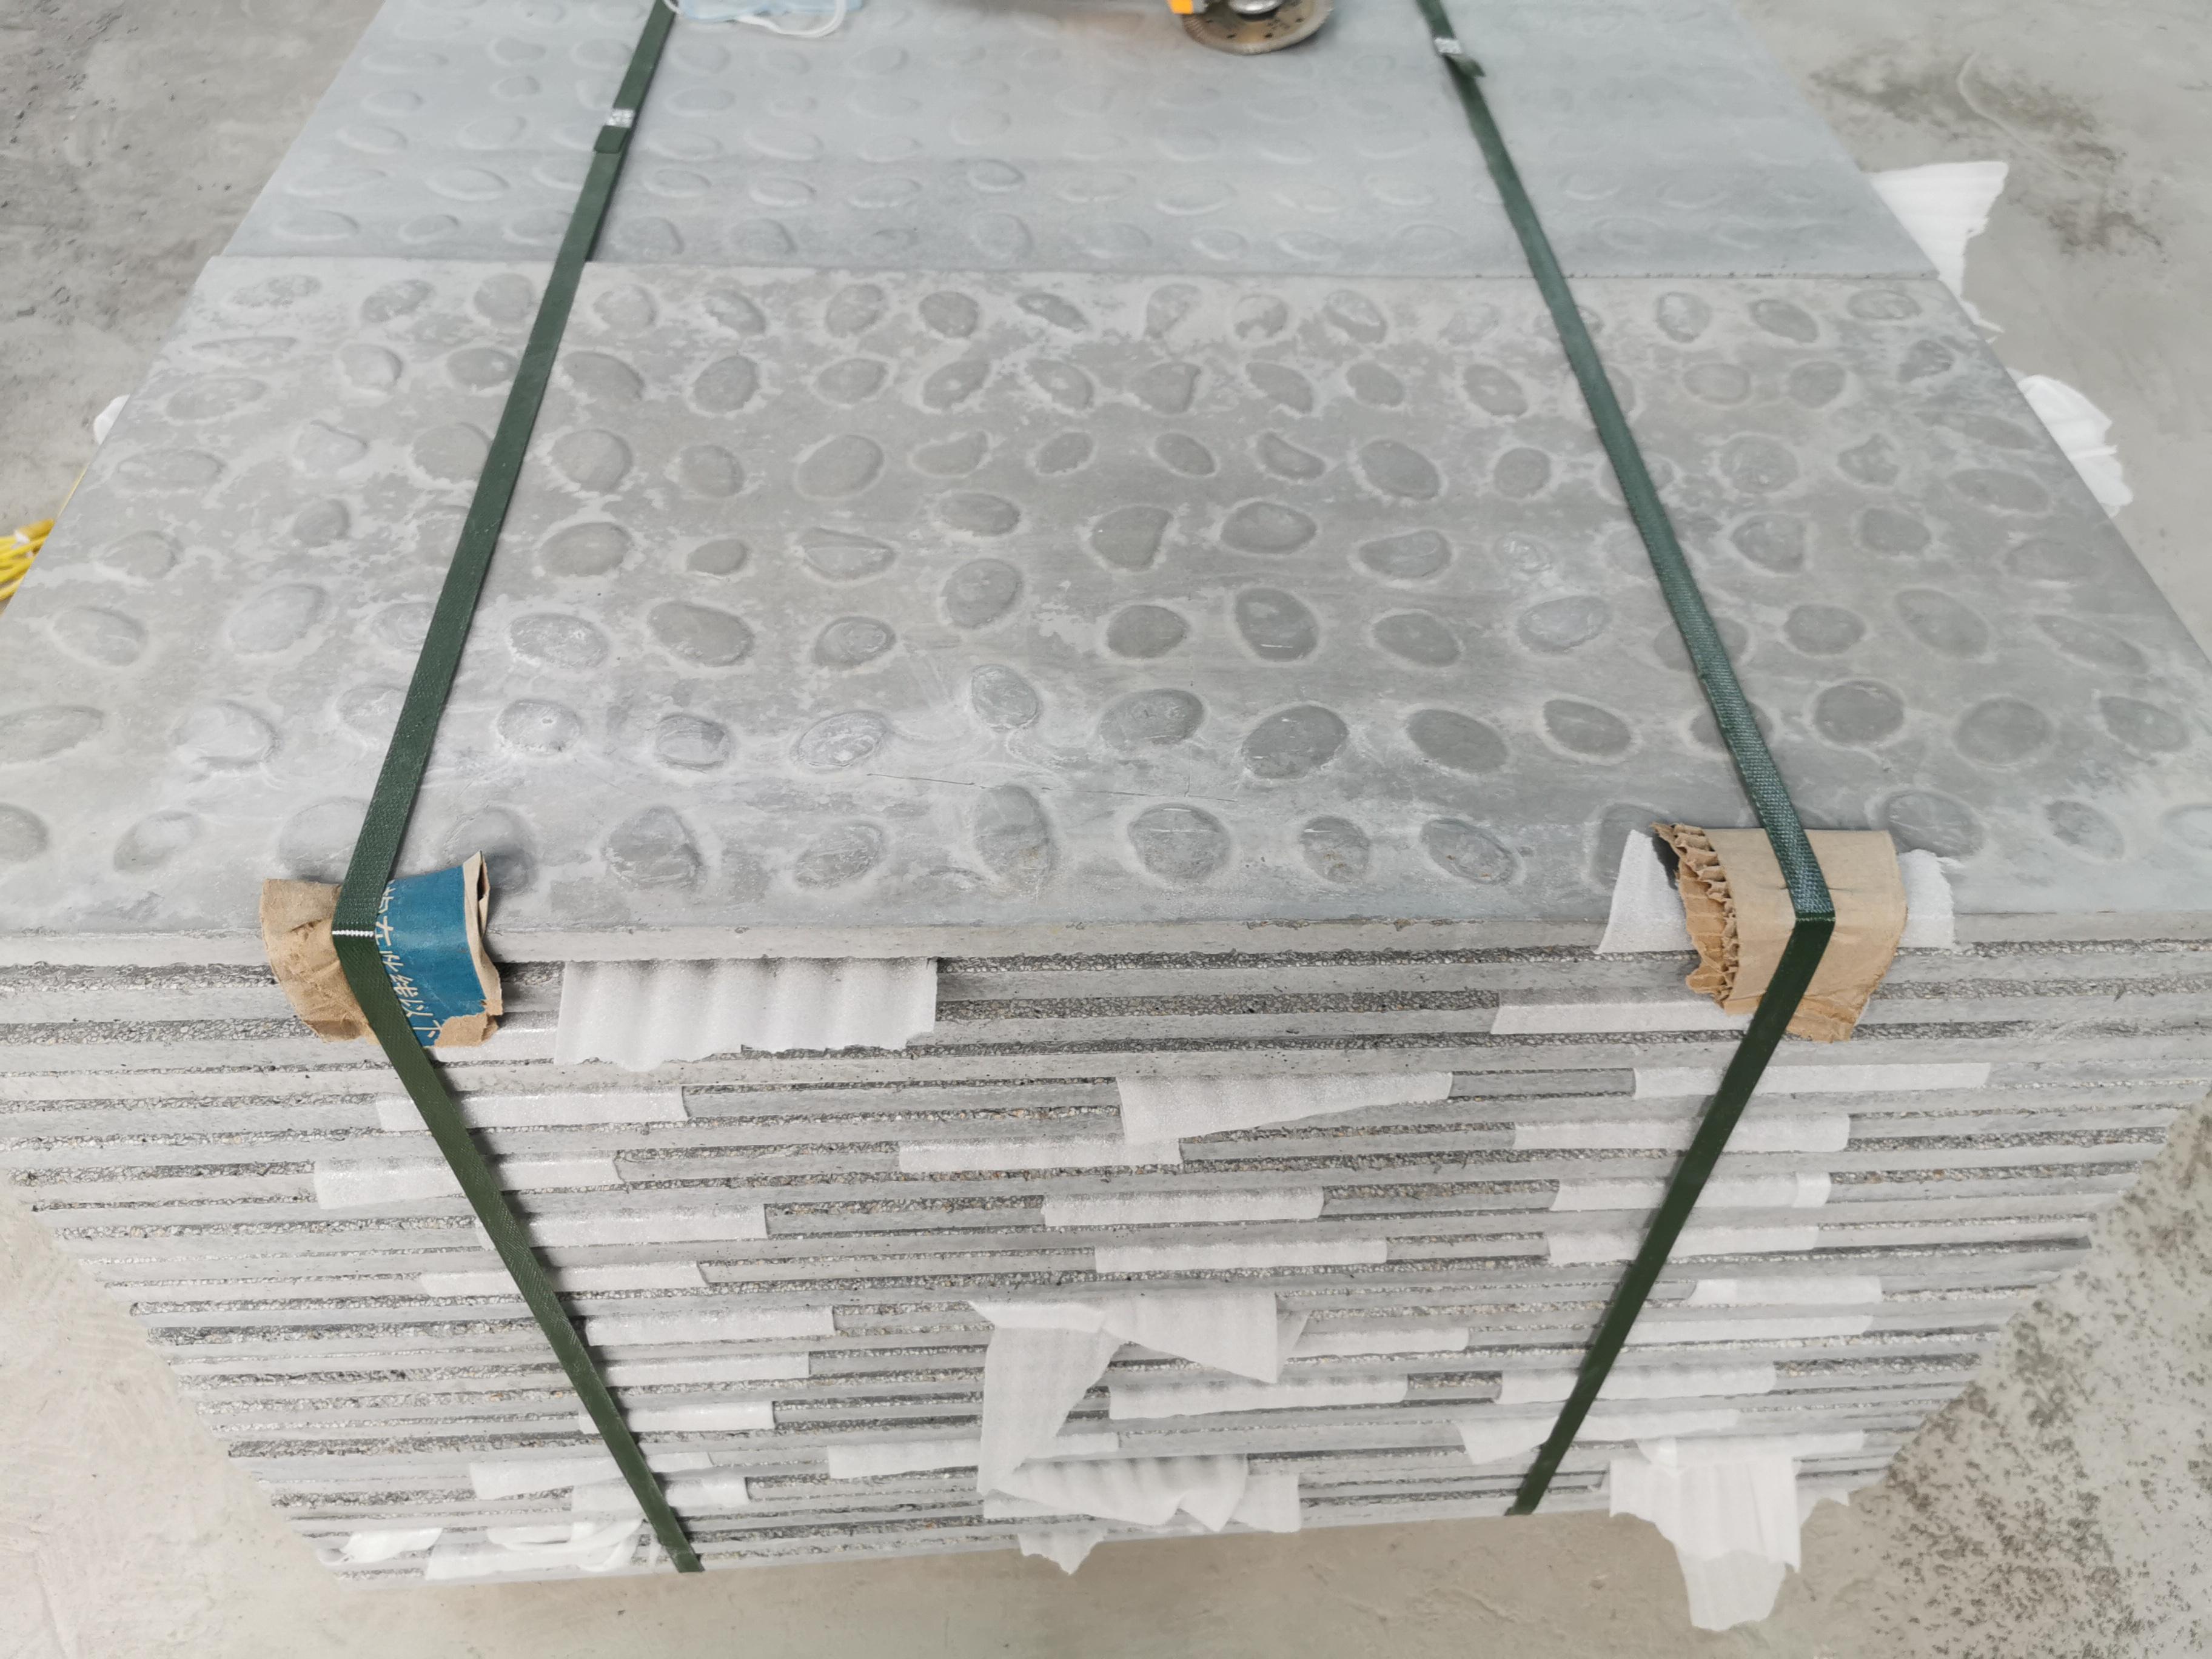 rpc电缆沟盖板宜采用什么材质?